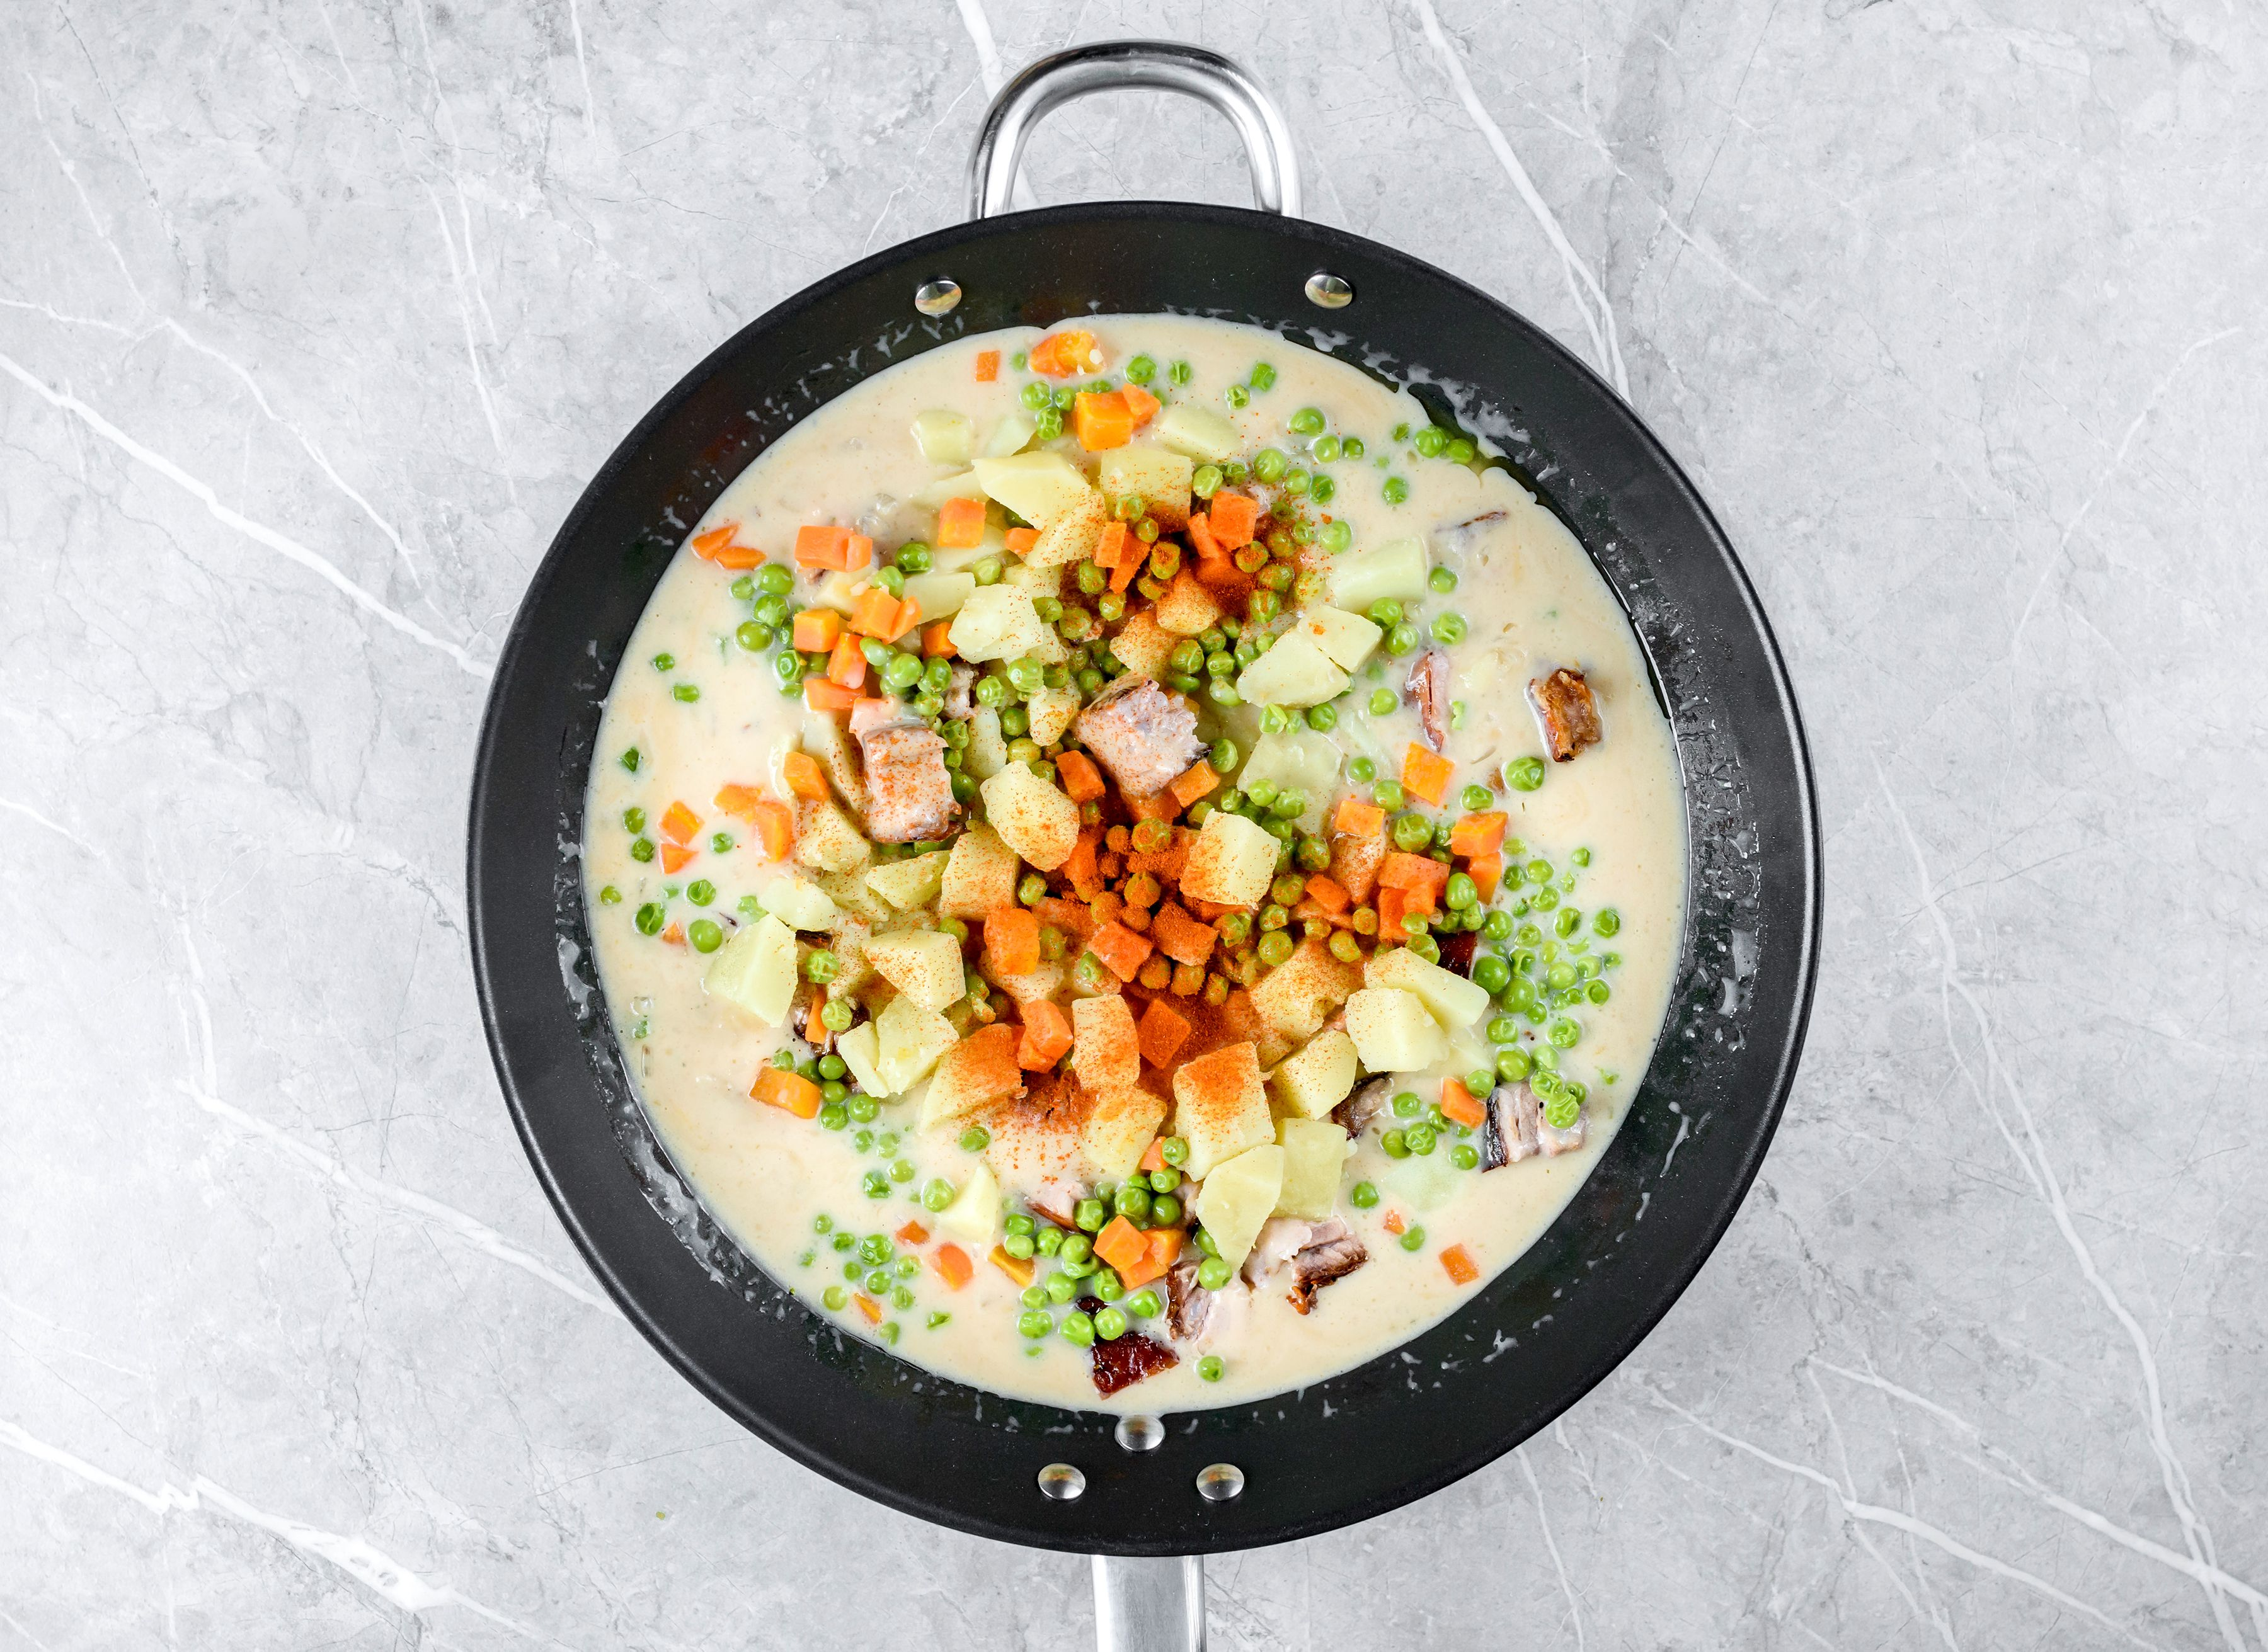 Add the pork, diced potato, peas, carrots, and paprika